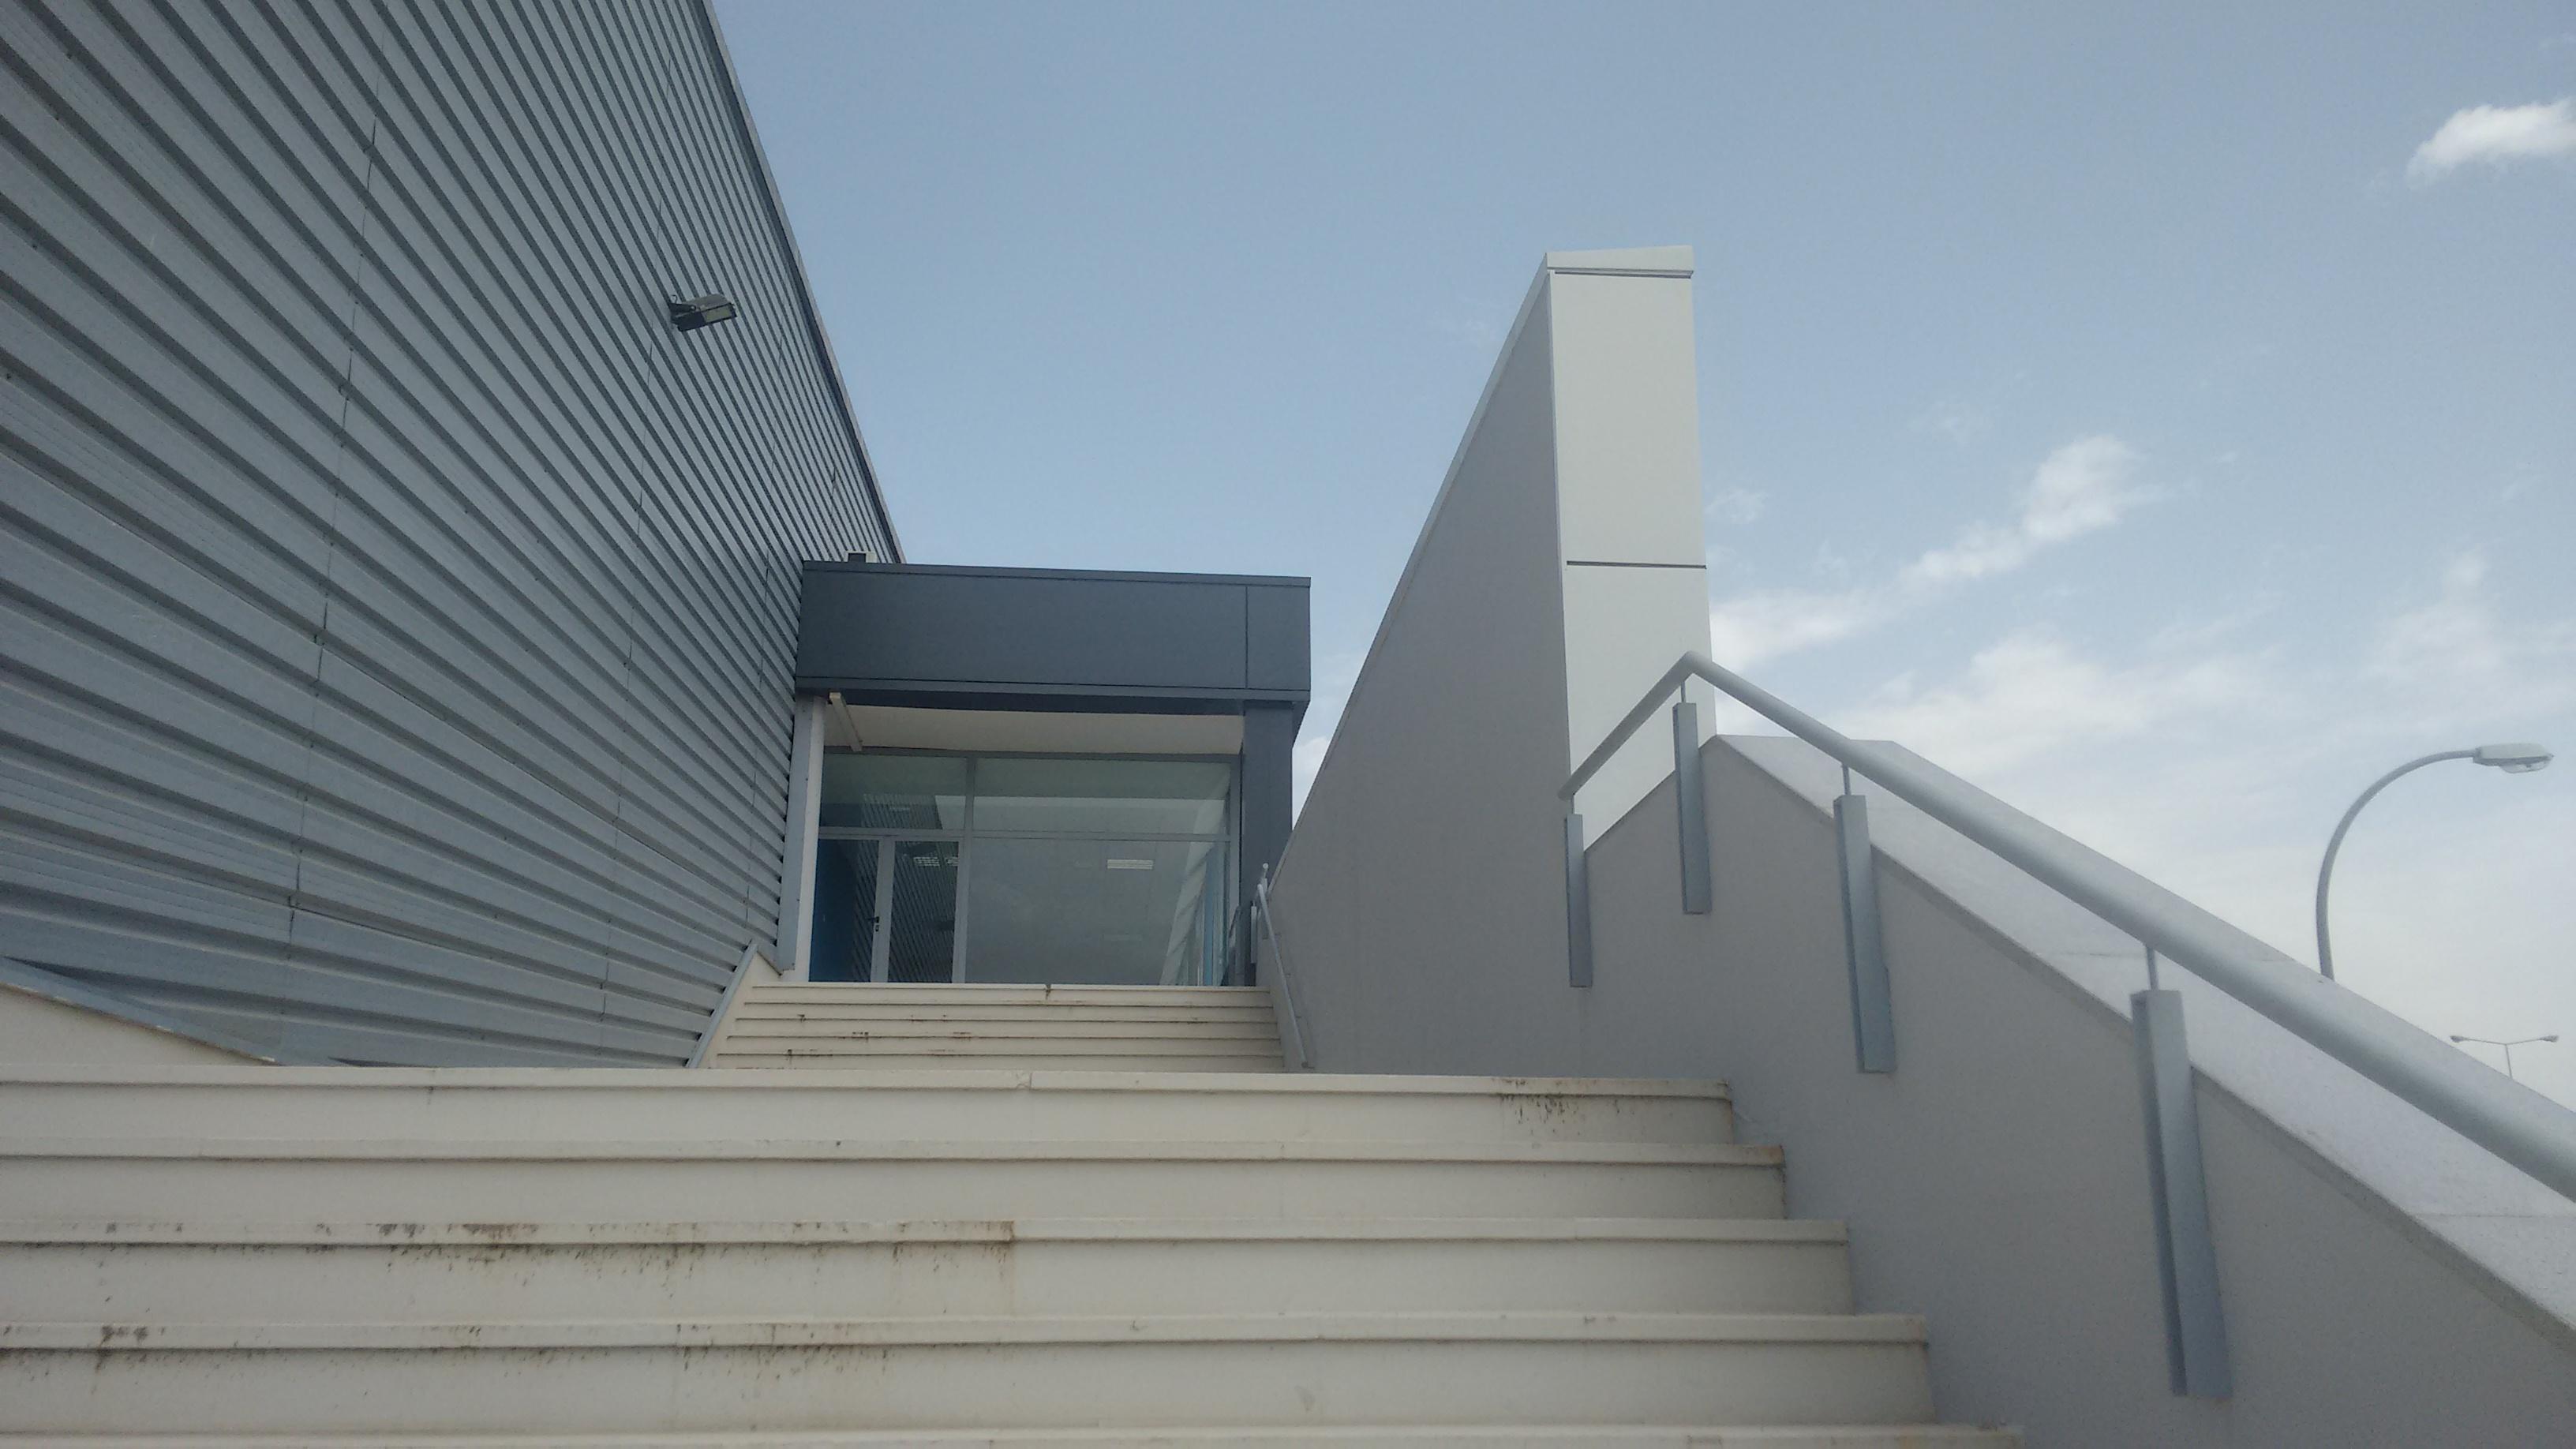 62 escalera fin constructora en sevilla - Constructoras en sevilla ...